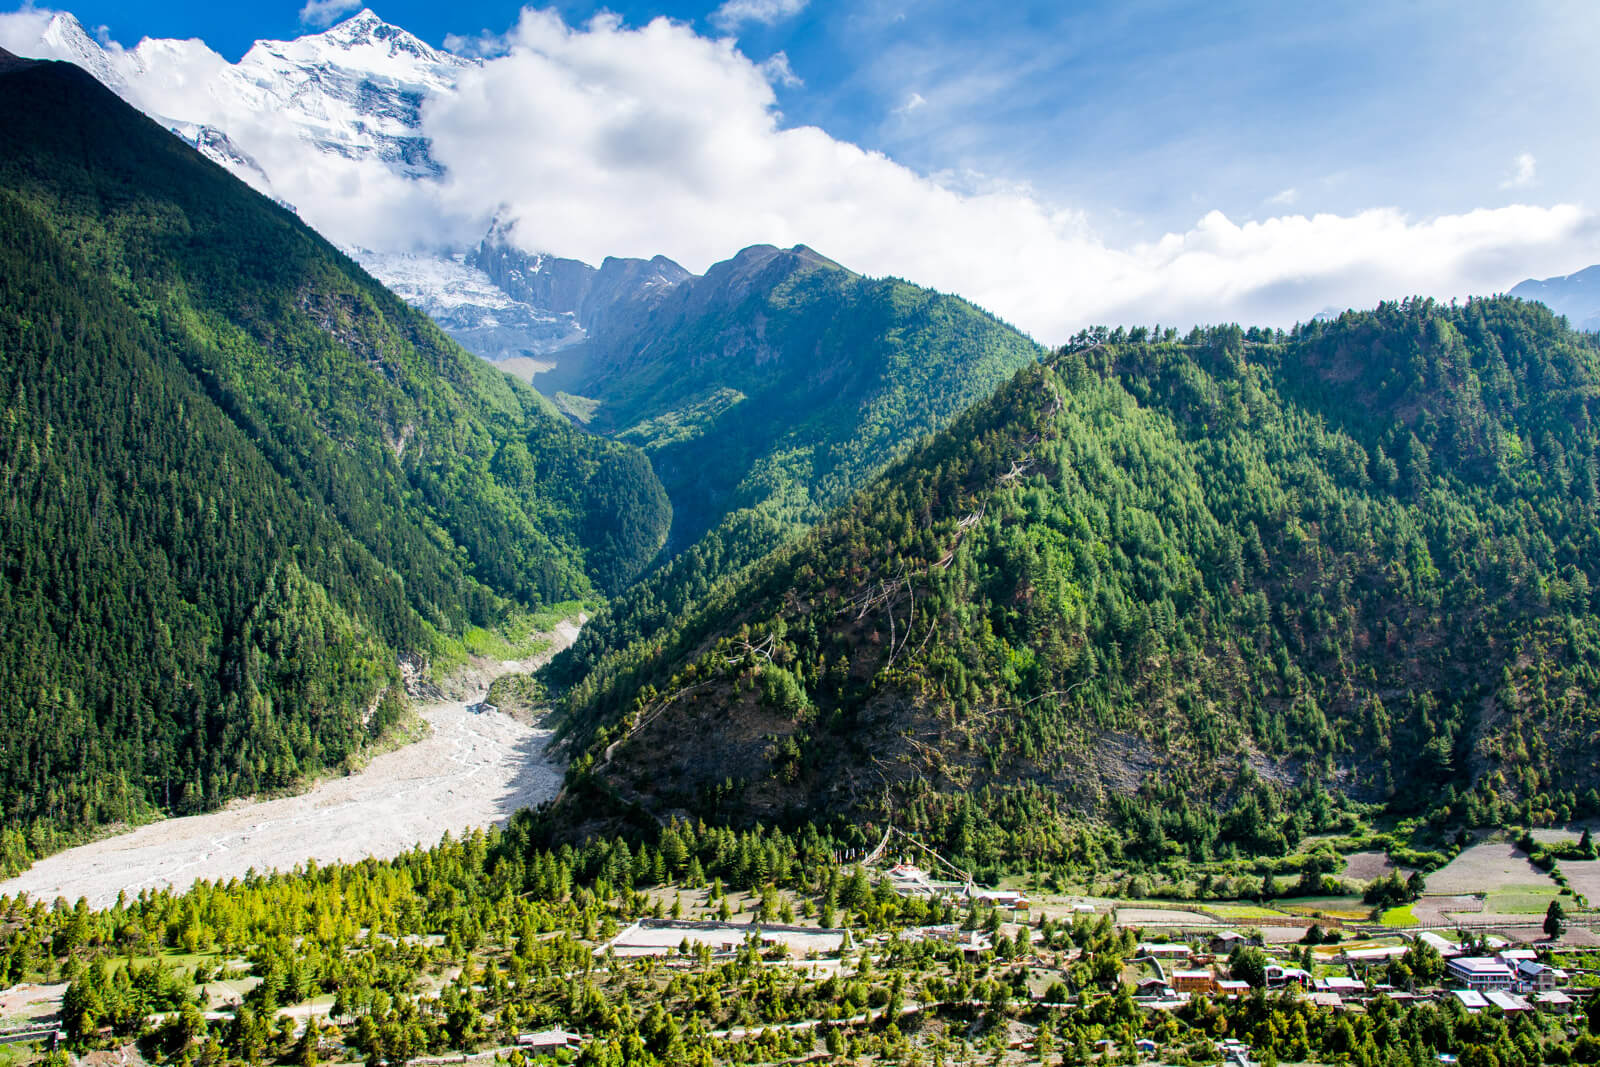 The view of the Annapurna Mountain Range from Upper Pisang, Annapurna Circuit Trek